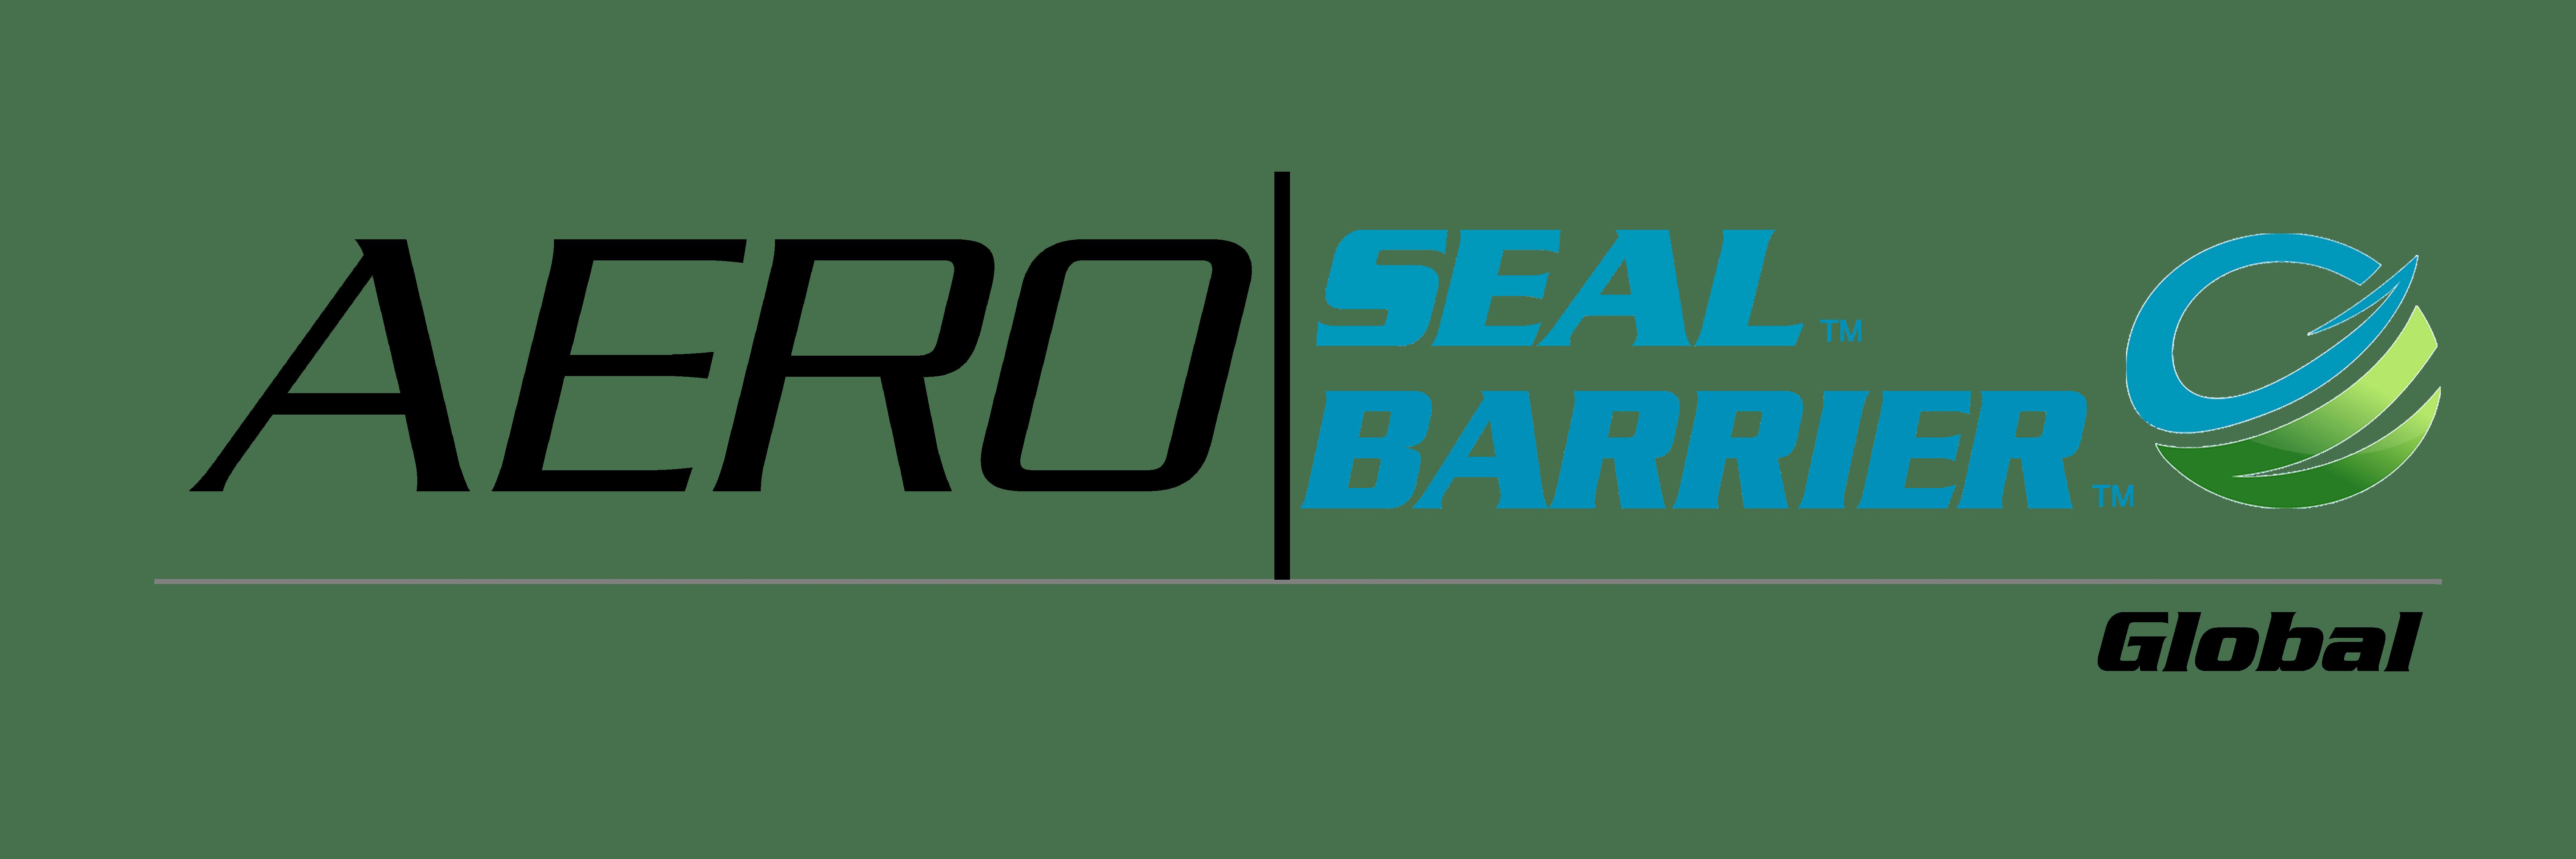 Aero-seal_barrier Global - Black - Large